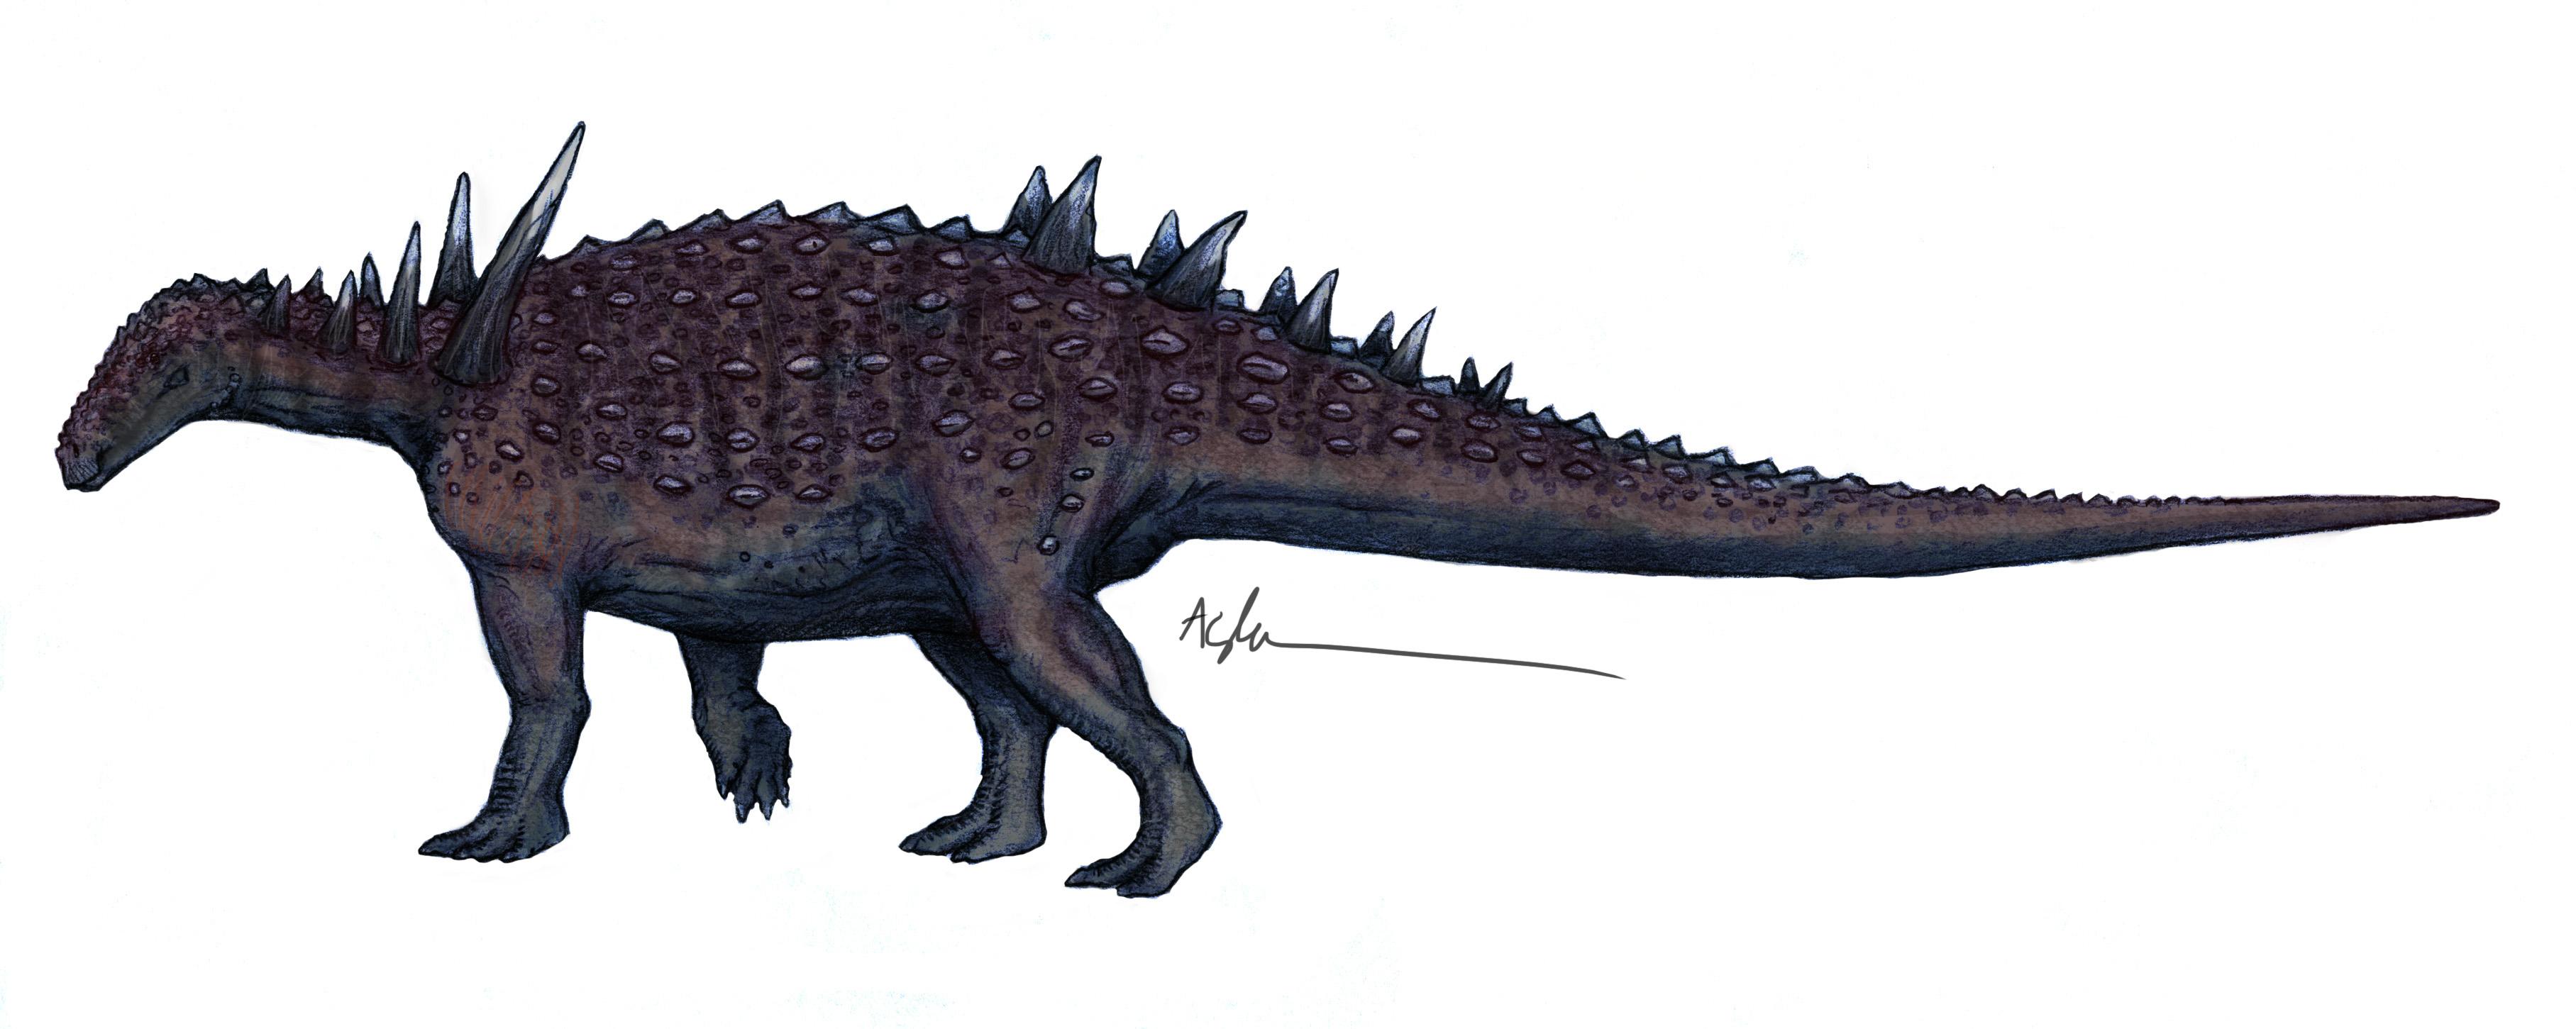 Asher Elbein alabama nodosaurid copy